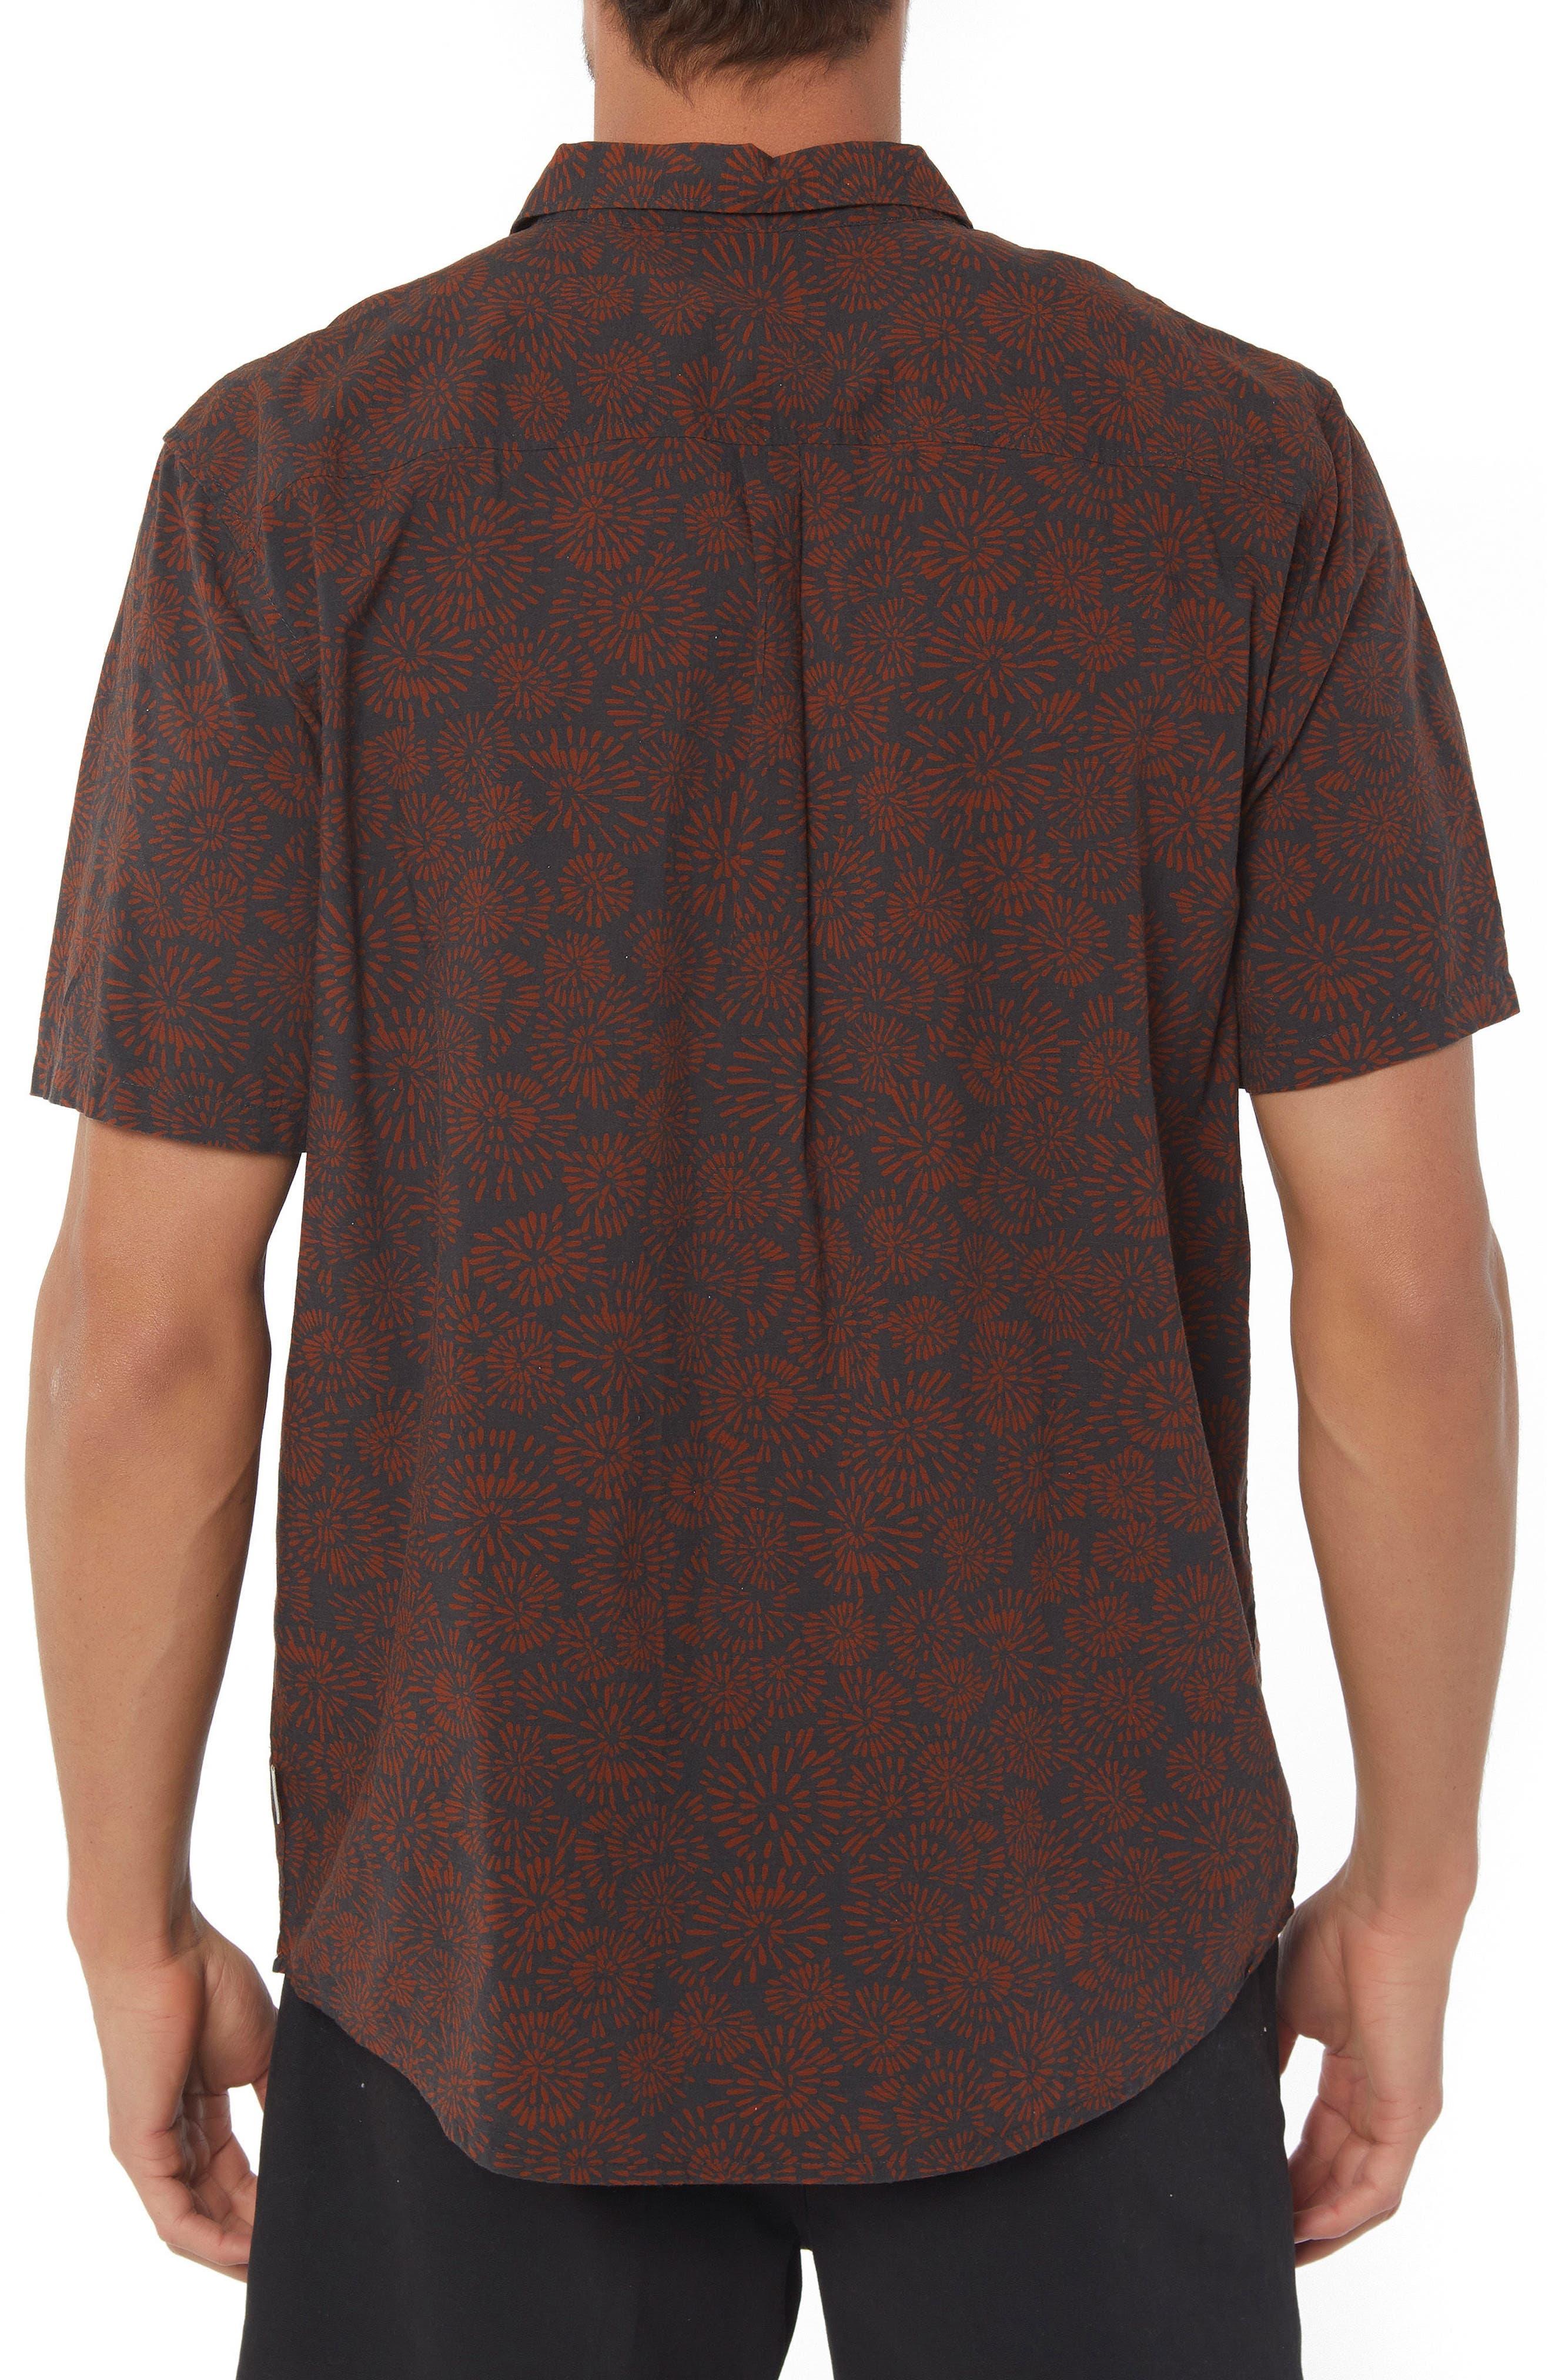 Upland Print Sport Shirt,                             Alternate thumbnail 2, color,                             Asphalt